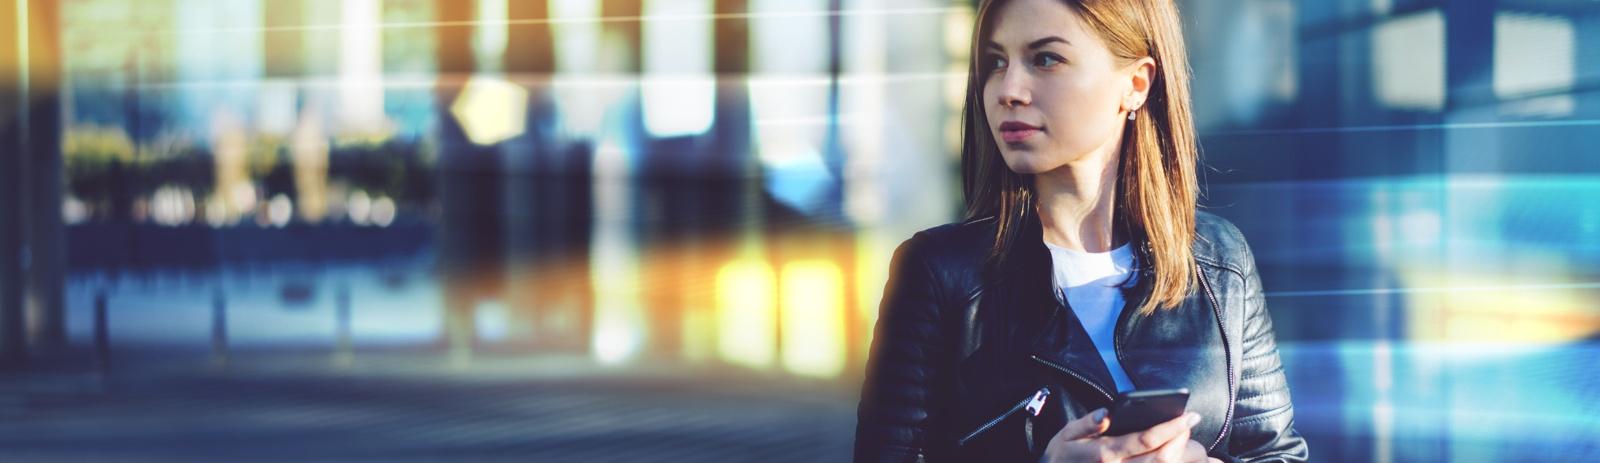 EXTRA - PILLAR-Woman-outside-1600x463px.jpg